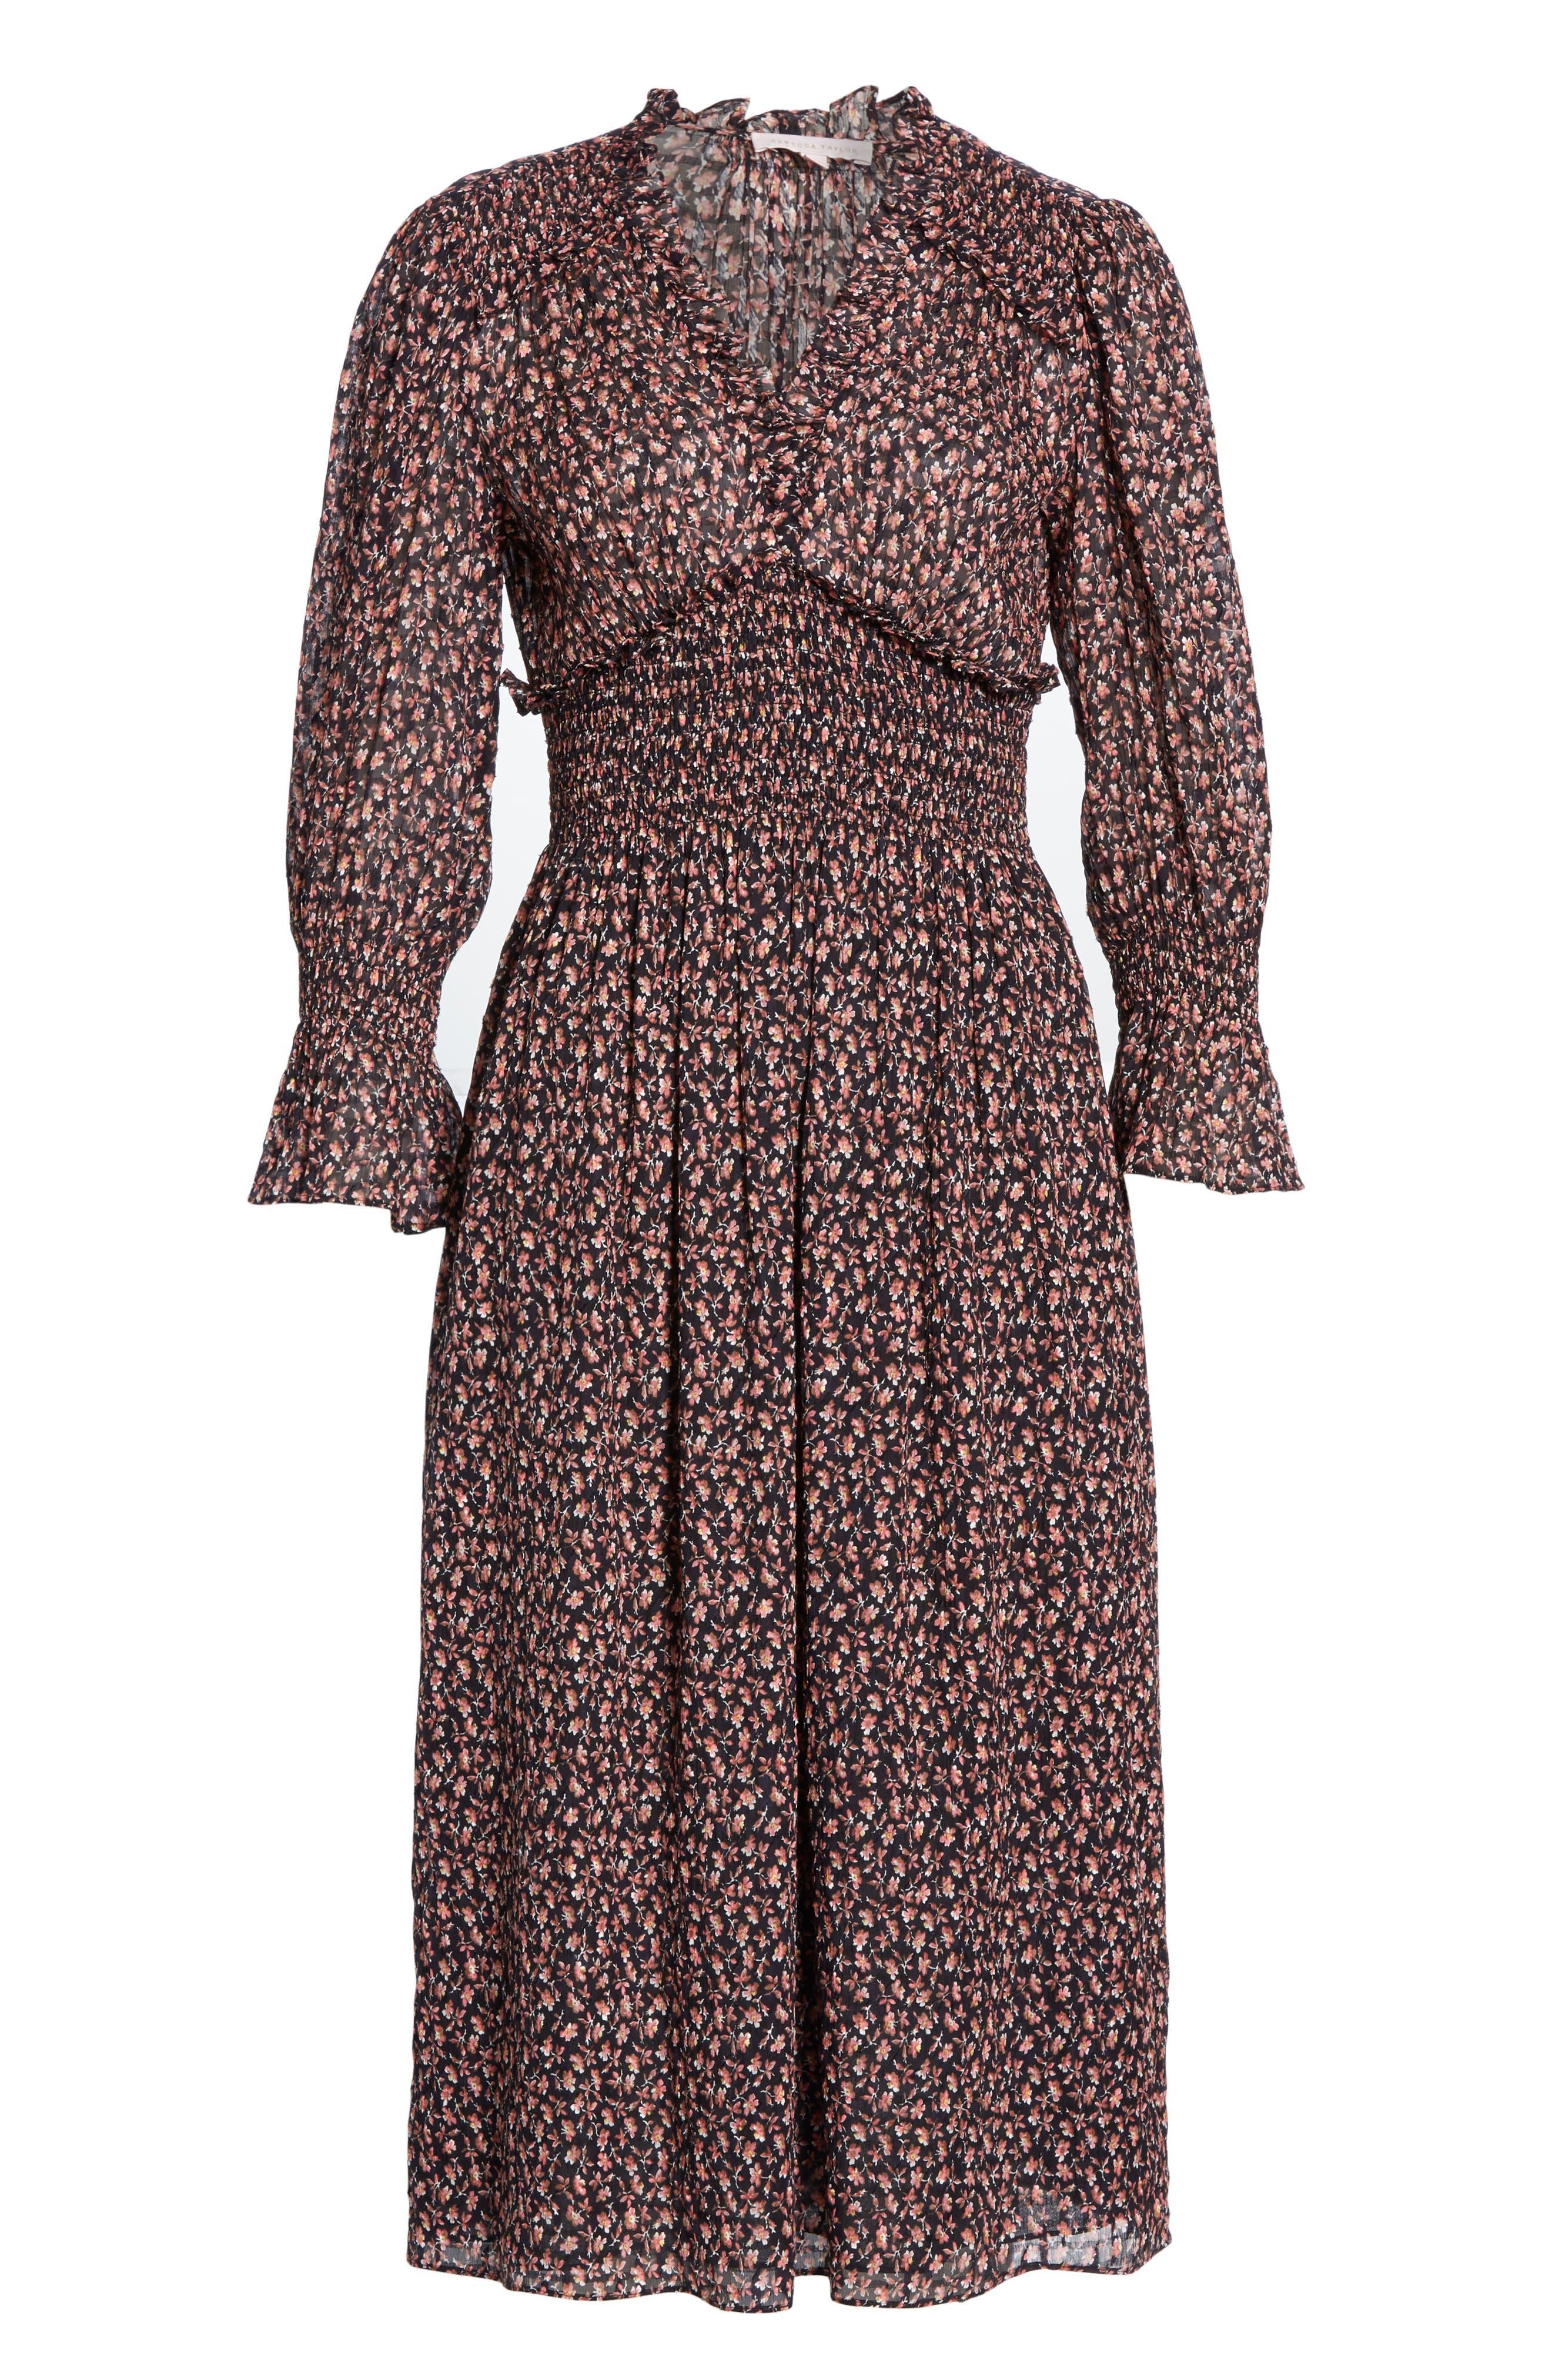 REBECCA TAYLOR, Floral Smock Detail Long Sleeve Silk & Cotton Dress, Alternate thumbnail 6, color, NAVY COMBO